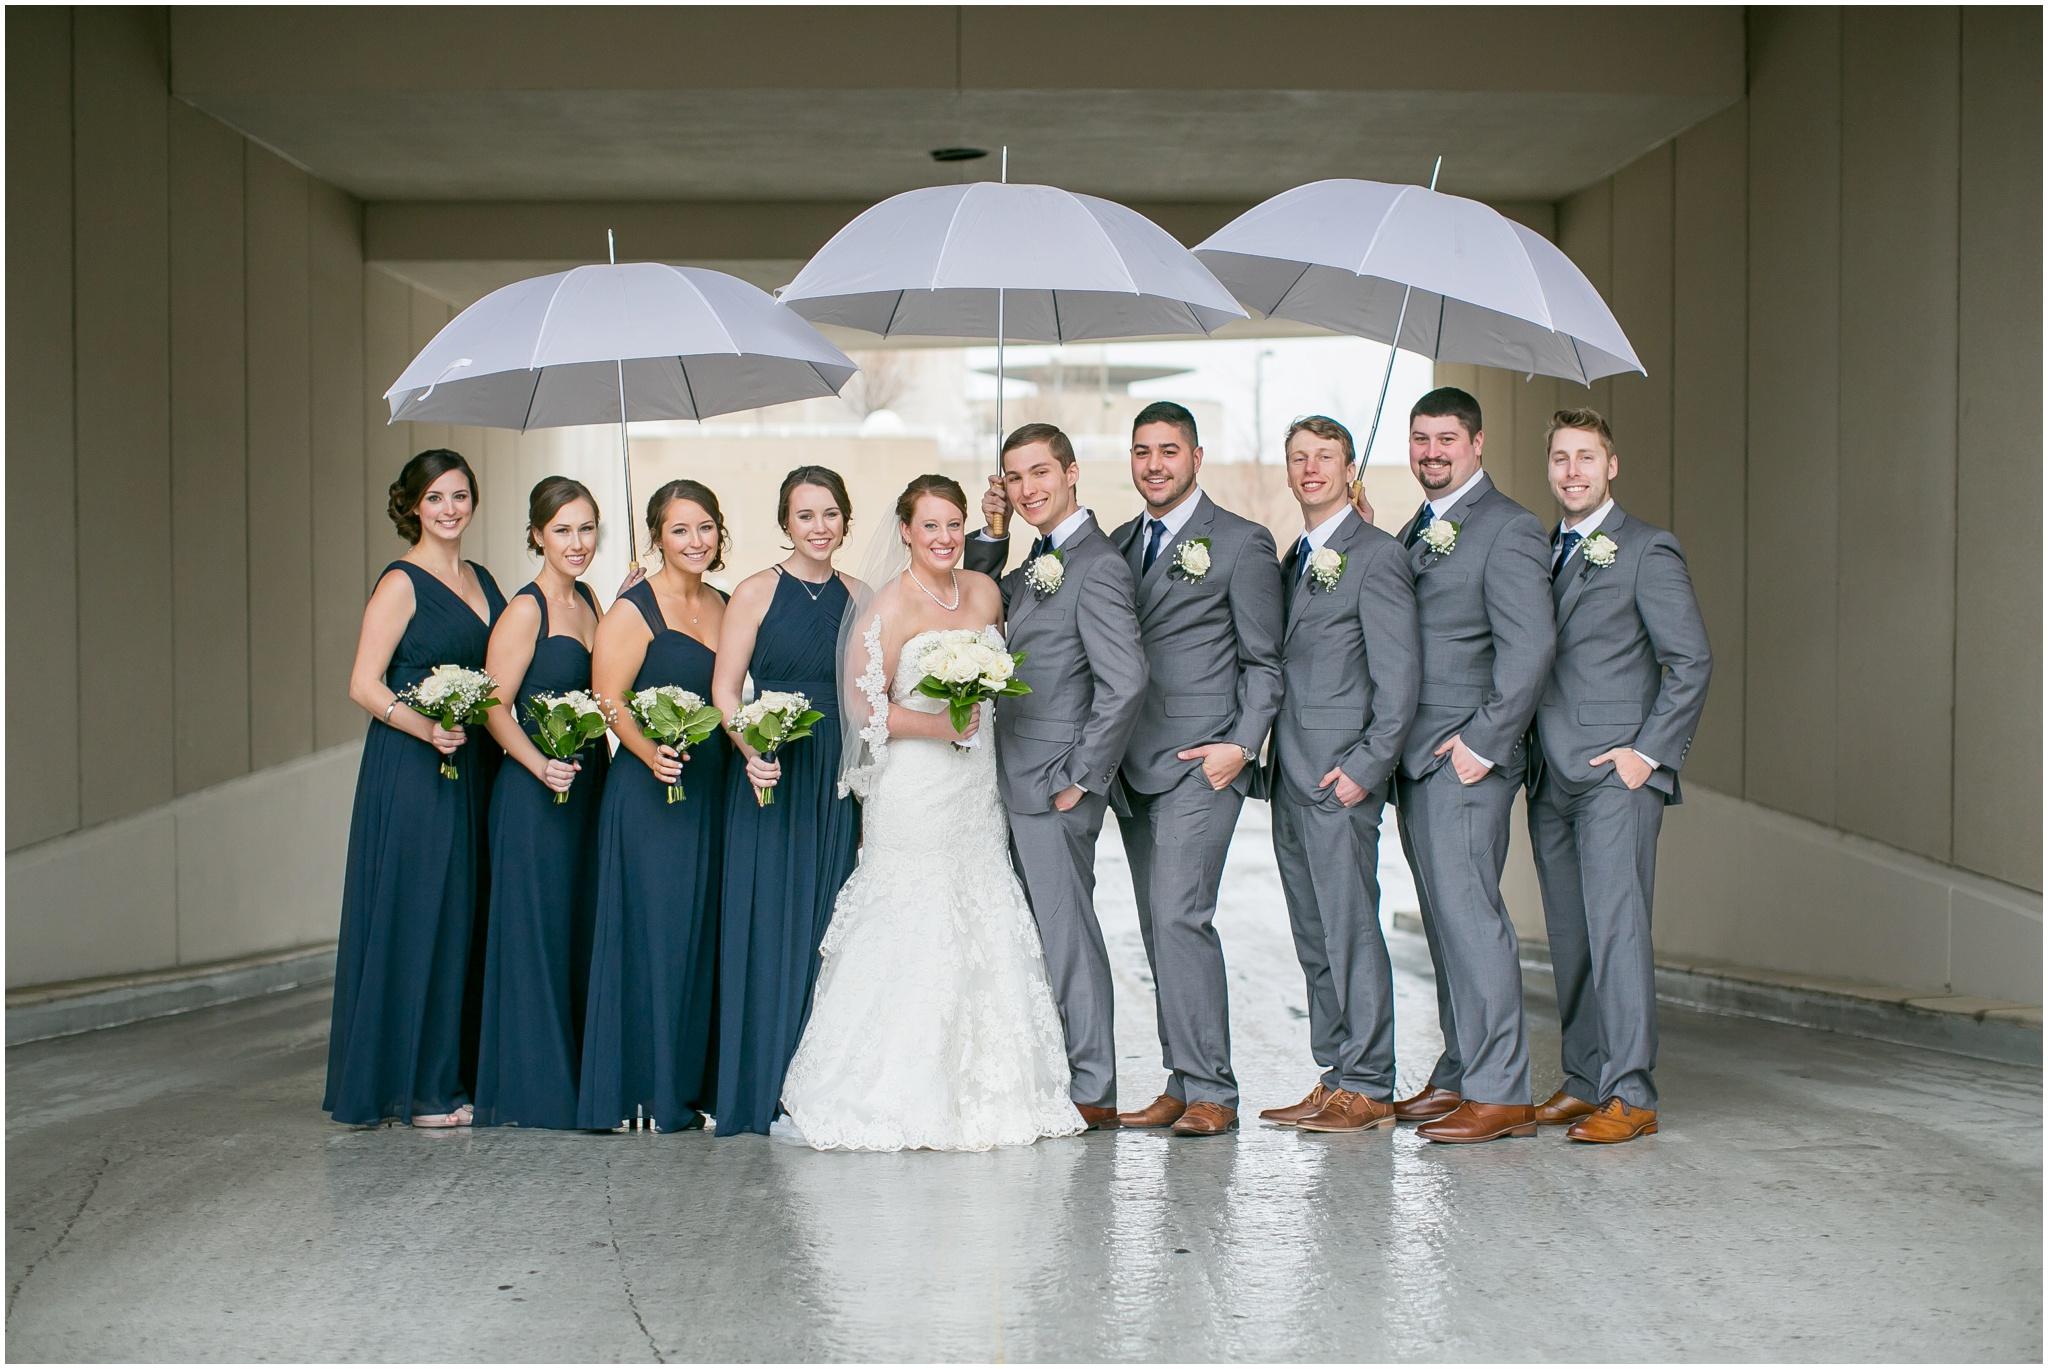 Madison_Club_Madison_Wisconsin_Wedding_Photographer_Spring_Rainy_Wedding_2602.jpg